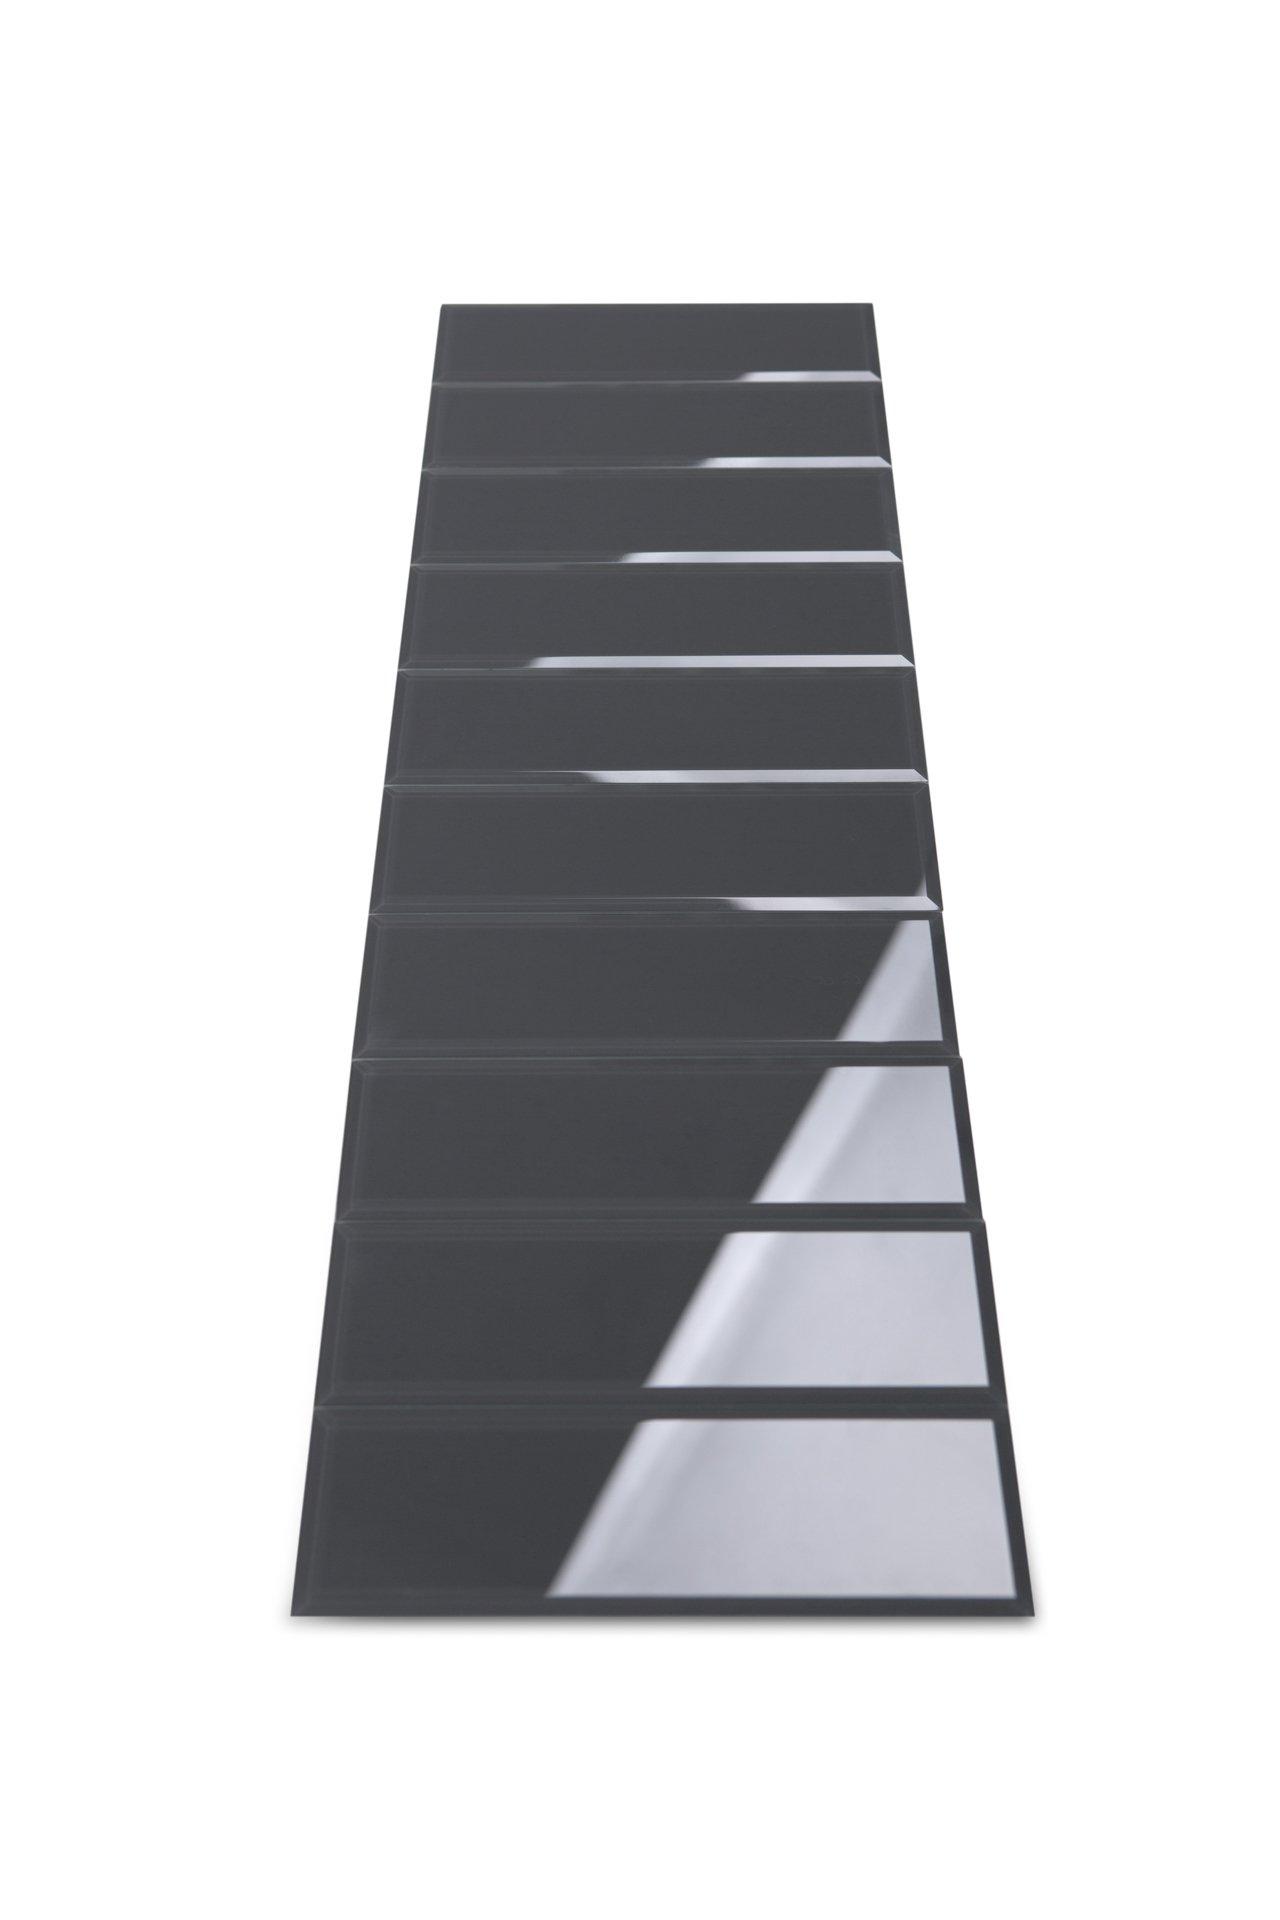 3'' x 10'' Subway/Brick Gray Glass Tile with Beveled Edge for Kitchen Backsplash/Bathroom 55 Tiles Kit/Covers 12sq/ft